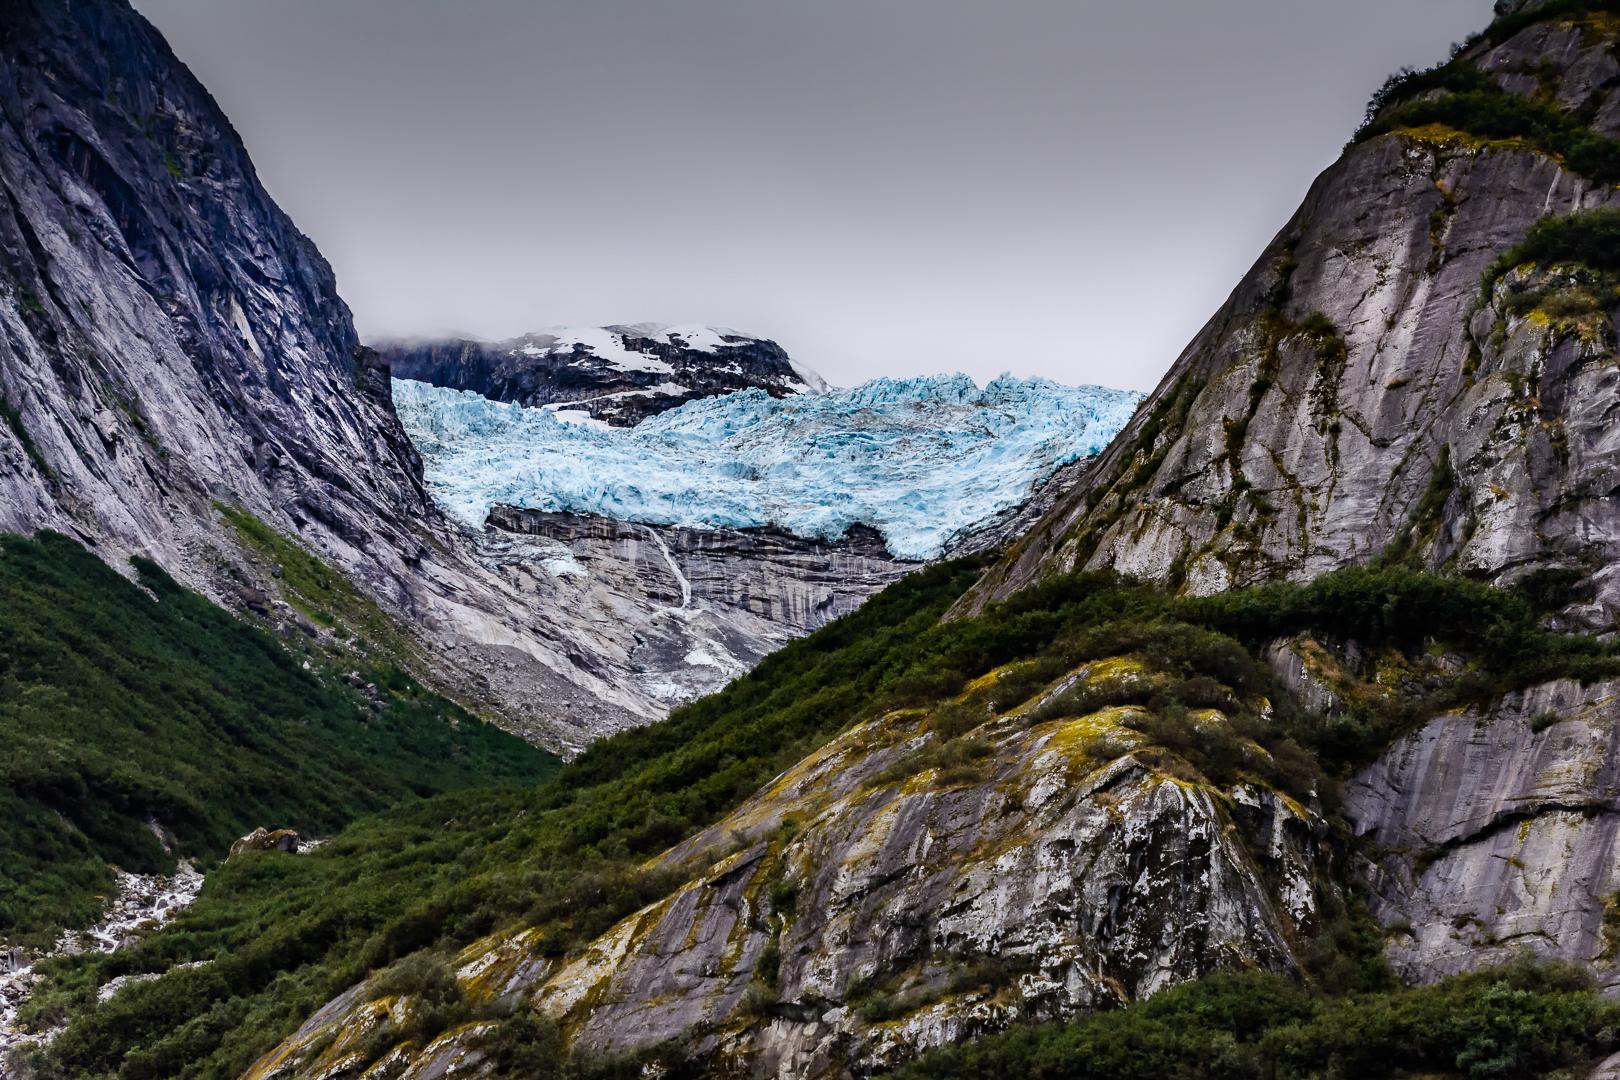 Retreating Glacier - Endicott Arm Fjord Alaska